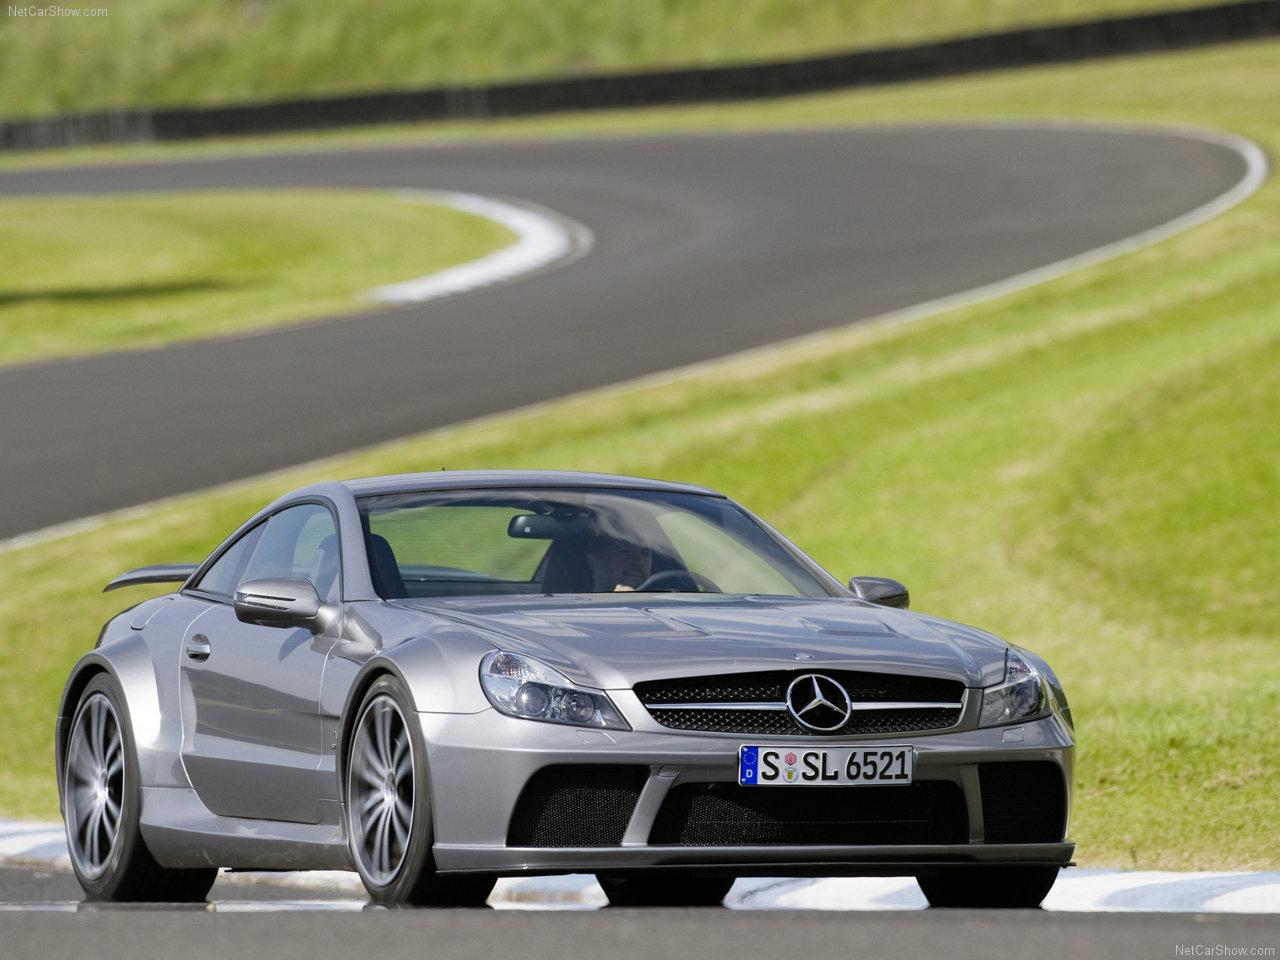 http://3.bp.blogspot.com/-s9xAZW8a-cE/TWnGACg_3RI/AAAAAAACLNw/-K-qXxPopc4/s1600/Mercedes-Benz-SL65_AMG_Black_Series_2009_1280x960_wallpaper_03.jpg